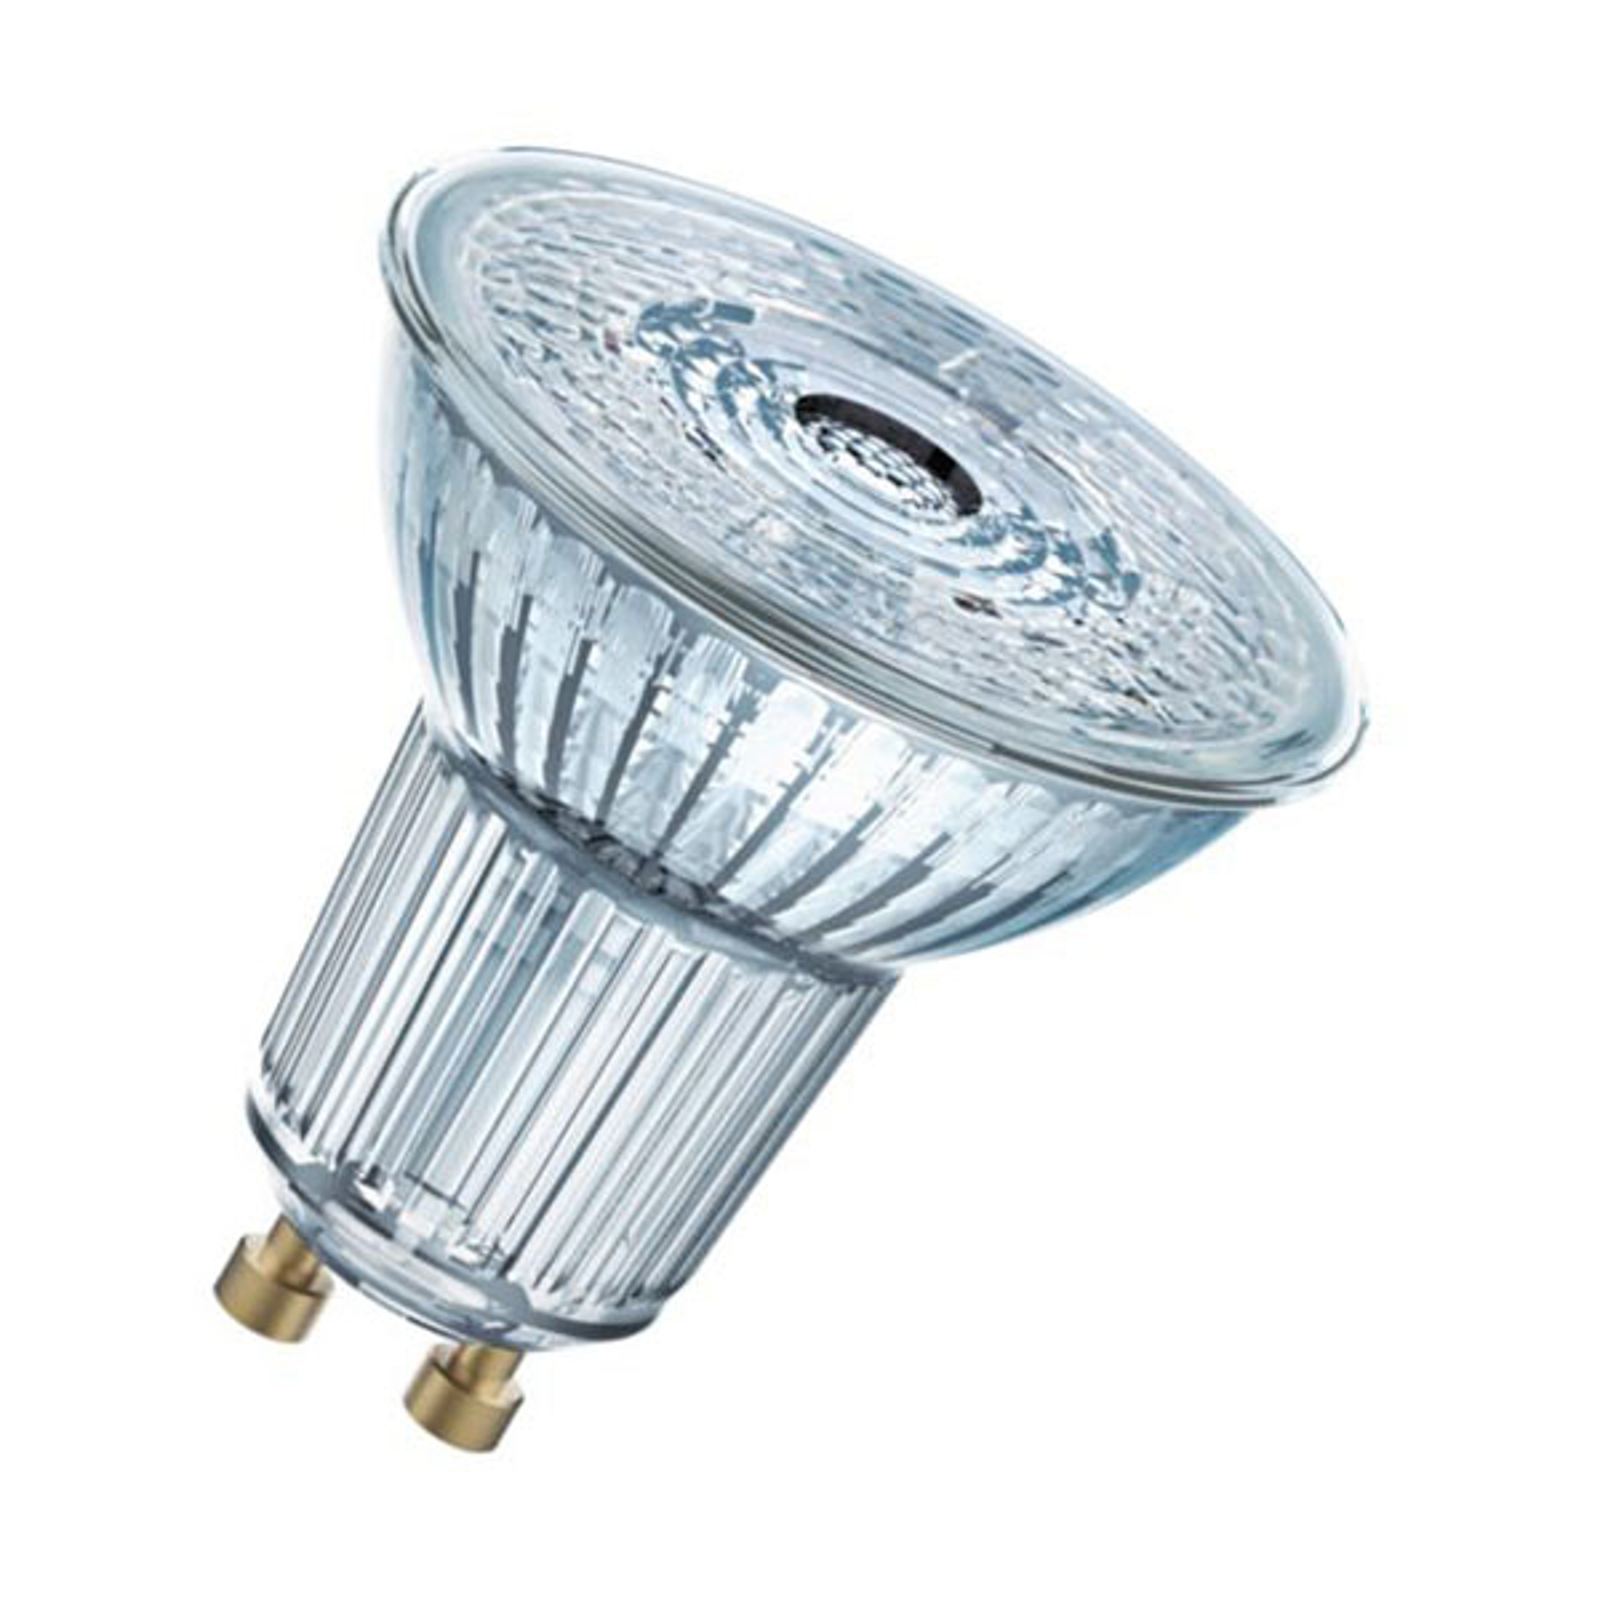 OSRAM szklany reflektor LED GU10 5,5W 927 36°